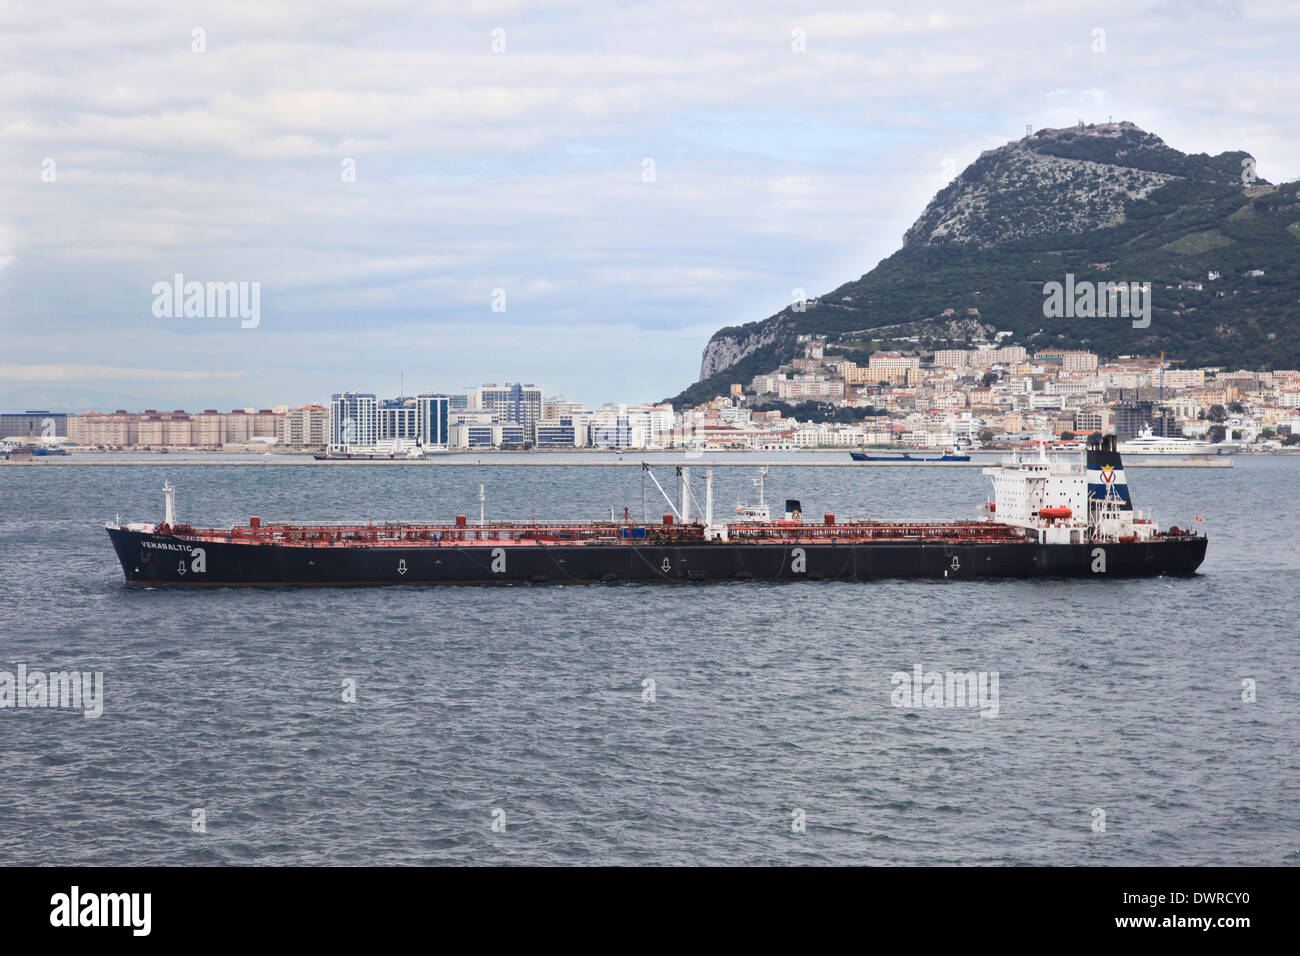 Crude oil tanker VEMABALTIC anchored in Gibraltar harbor - Stock Image